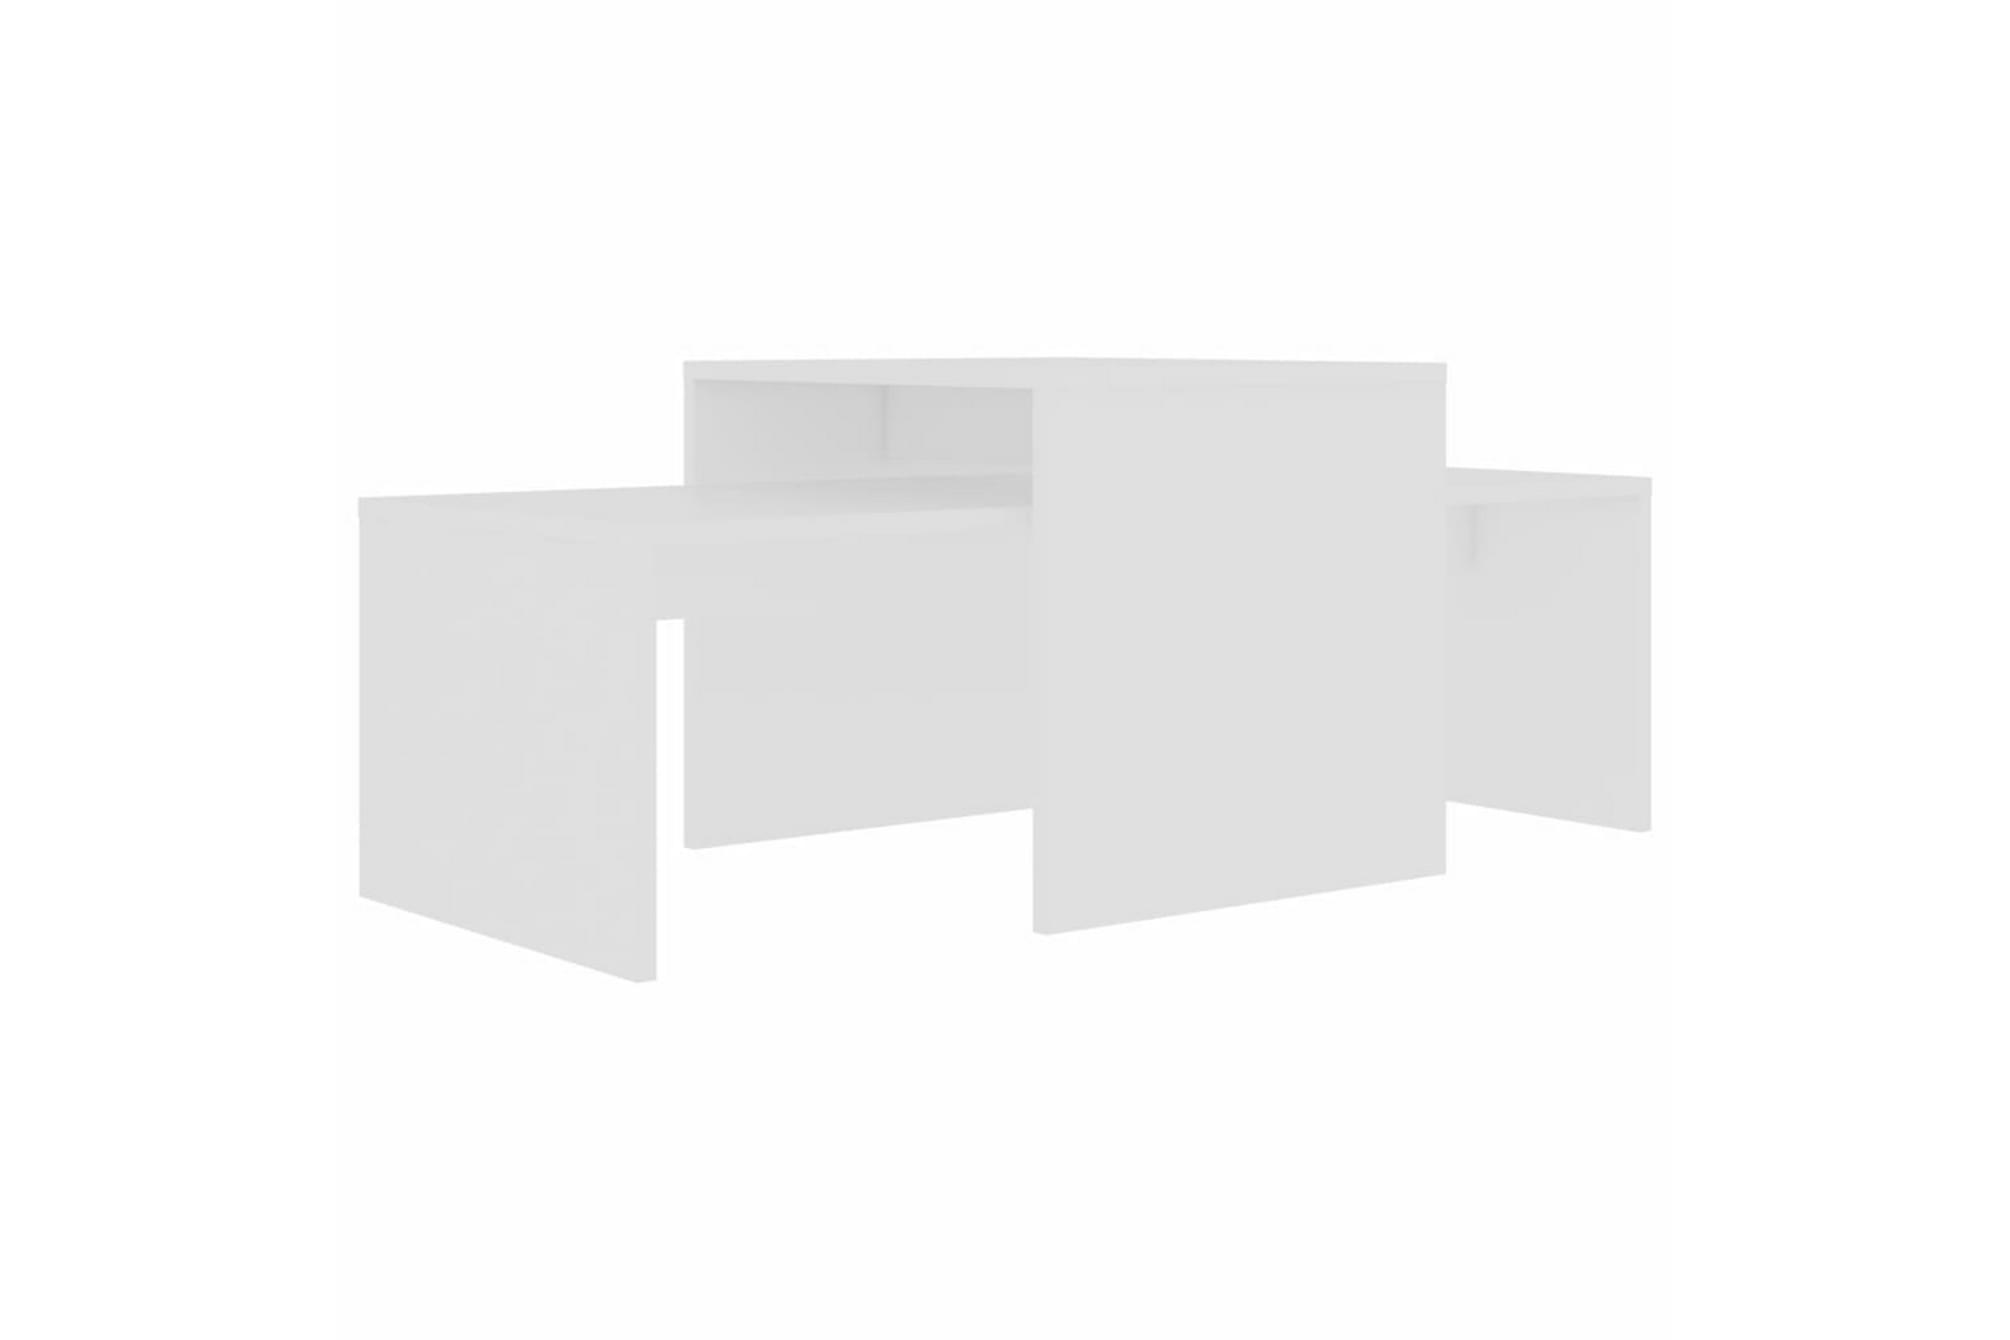 Soffbord set vit 100x48x40 cm spånskiva